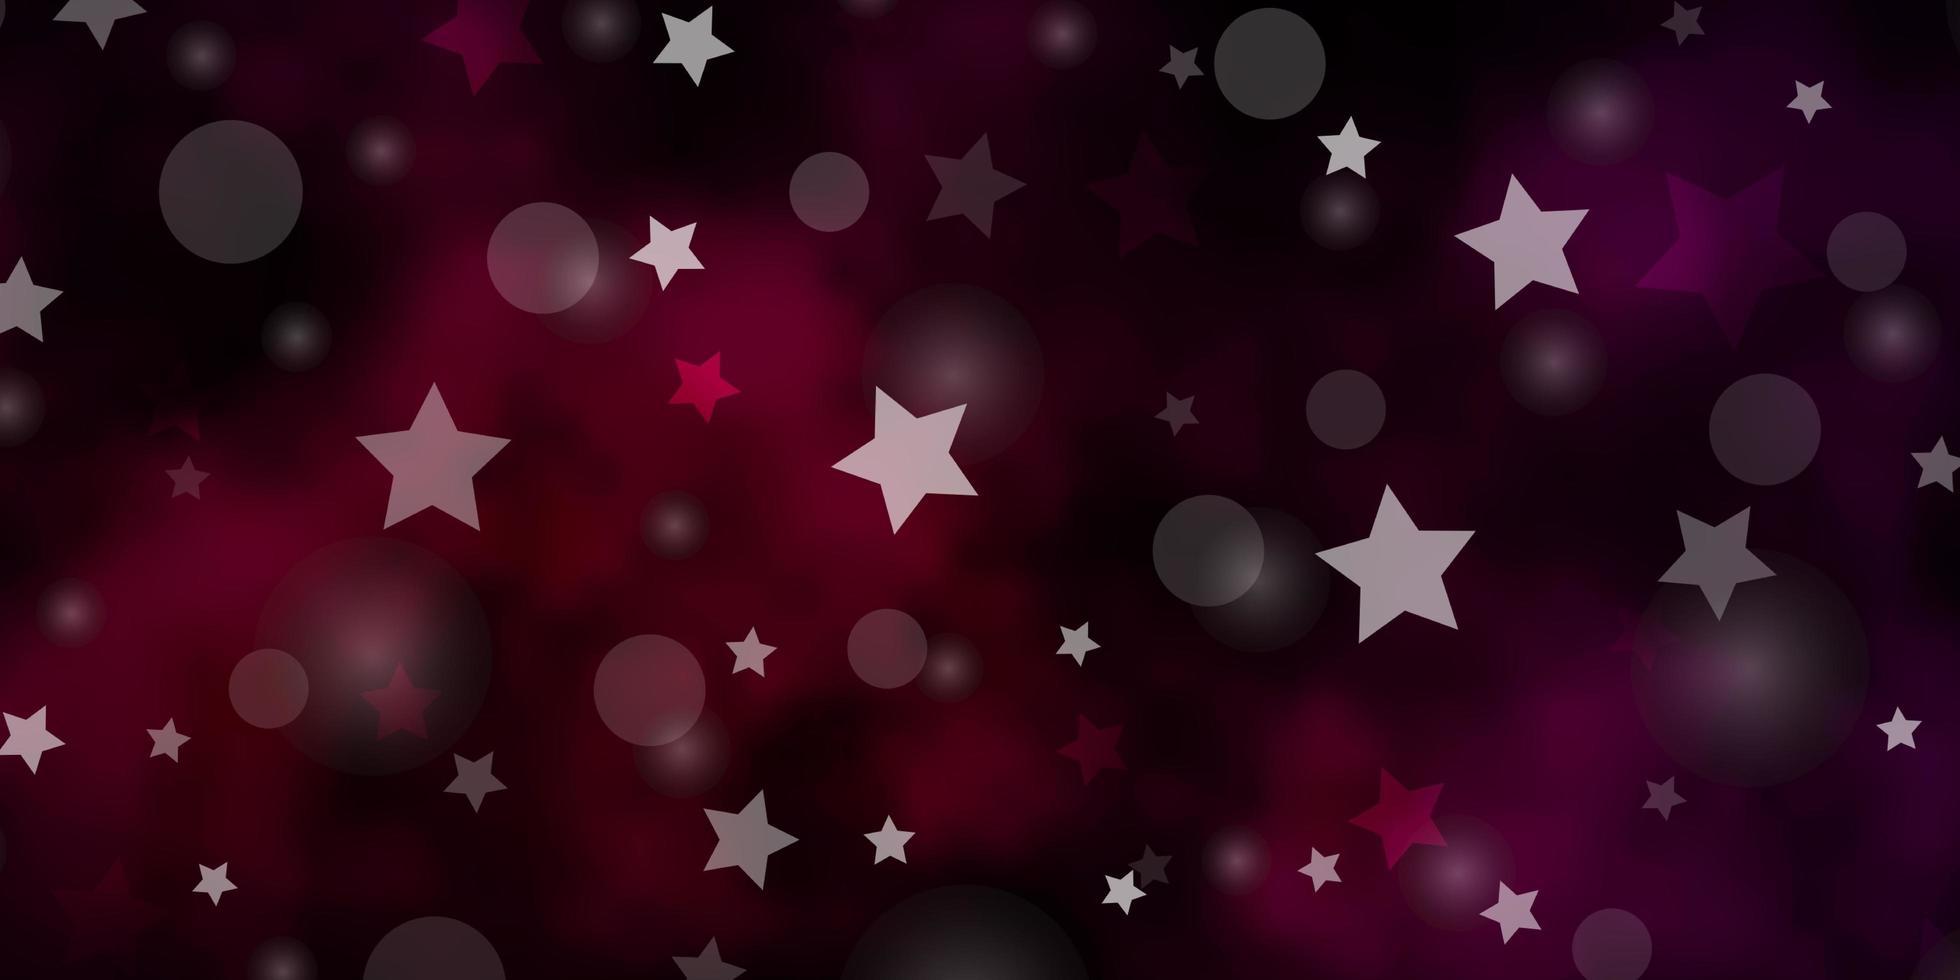 textura de vector púrpura oscuro con círculos, estrellas